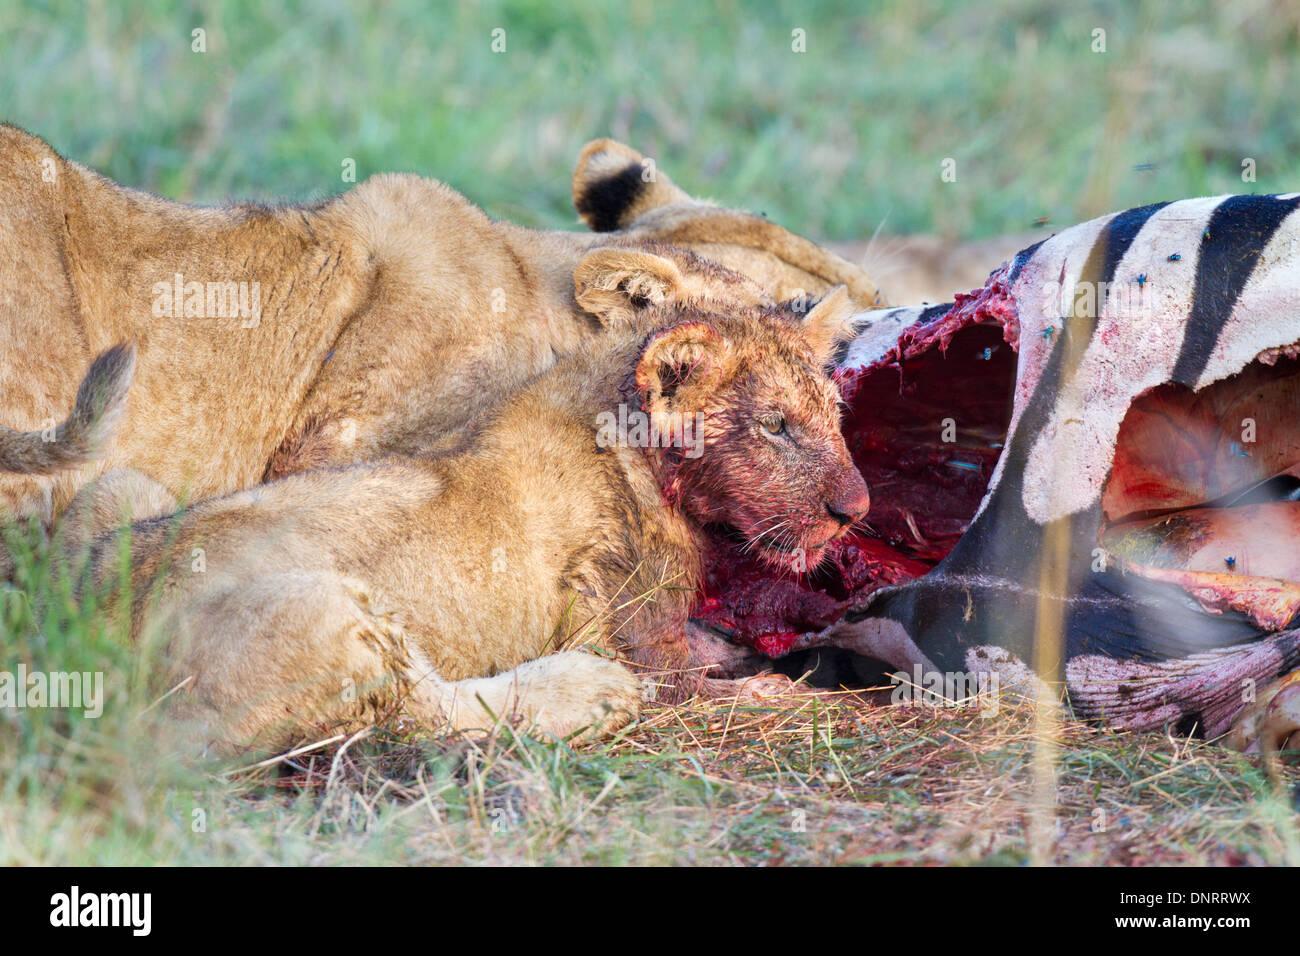 Lion cub mangiare zebra in Mara riserva, Kenya Immagini Stock